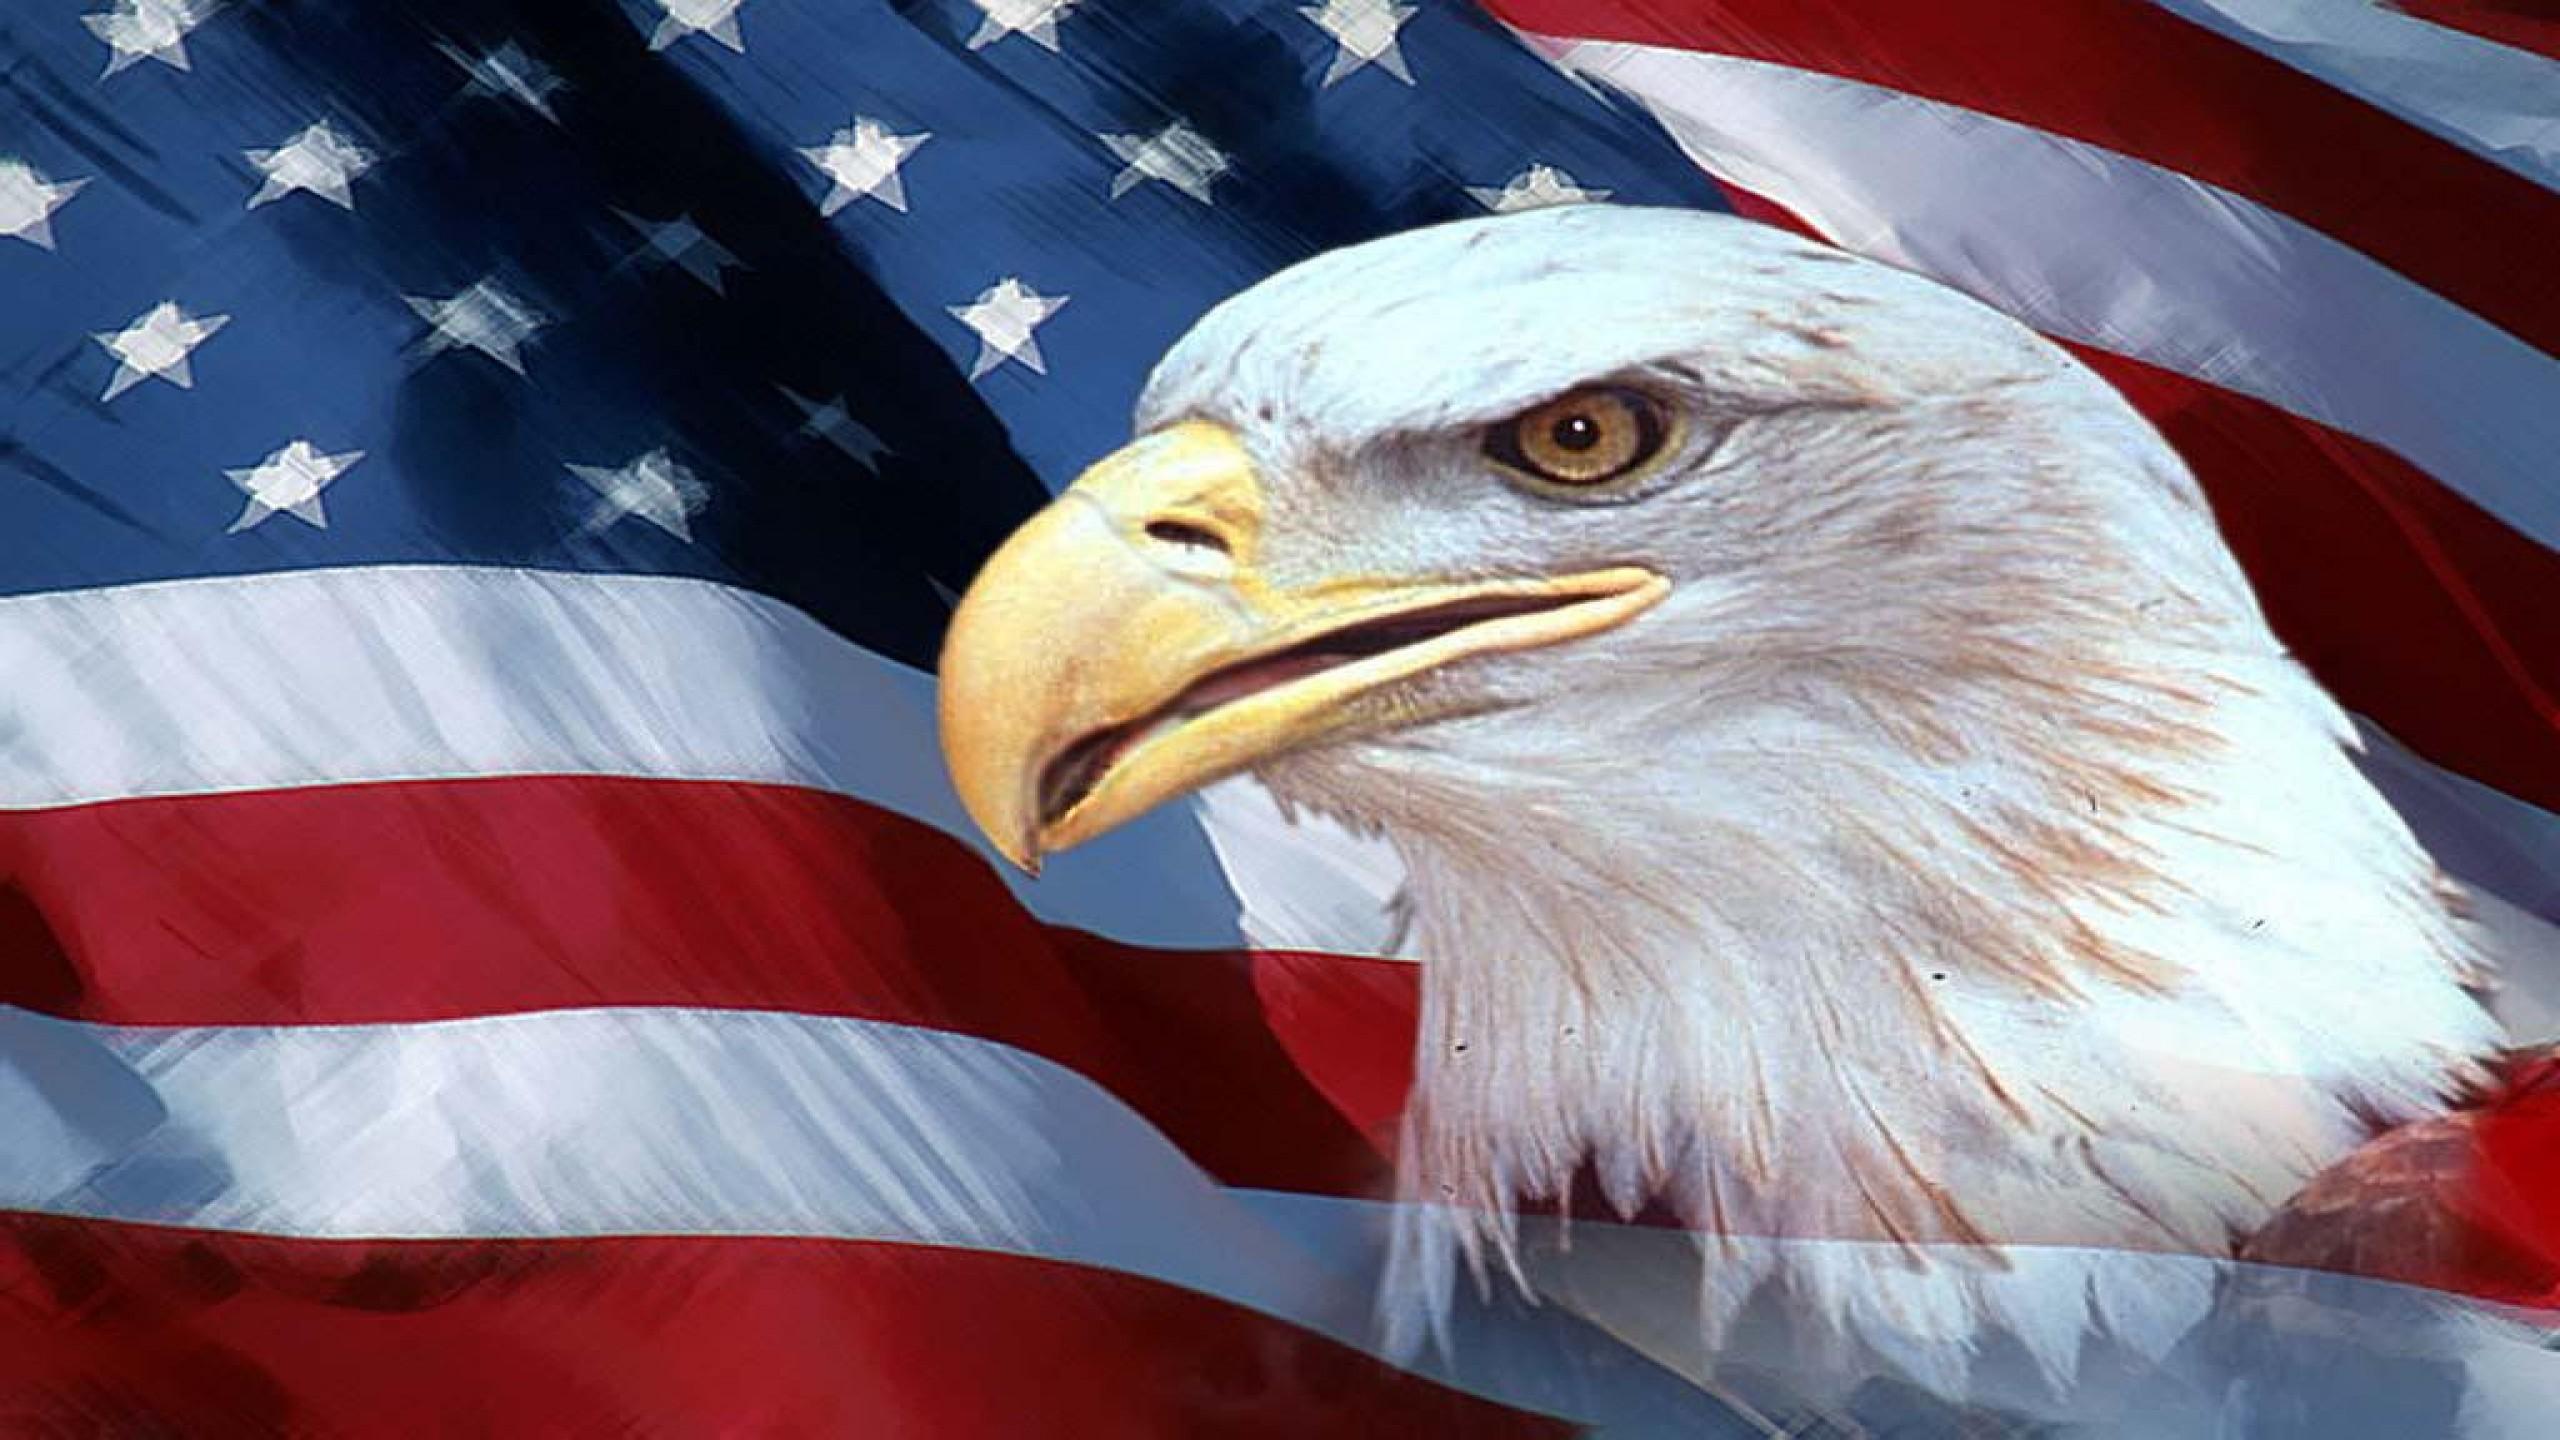 American Flag with Eagle Wallpaper - WallpaperSafari